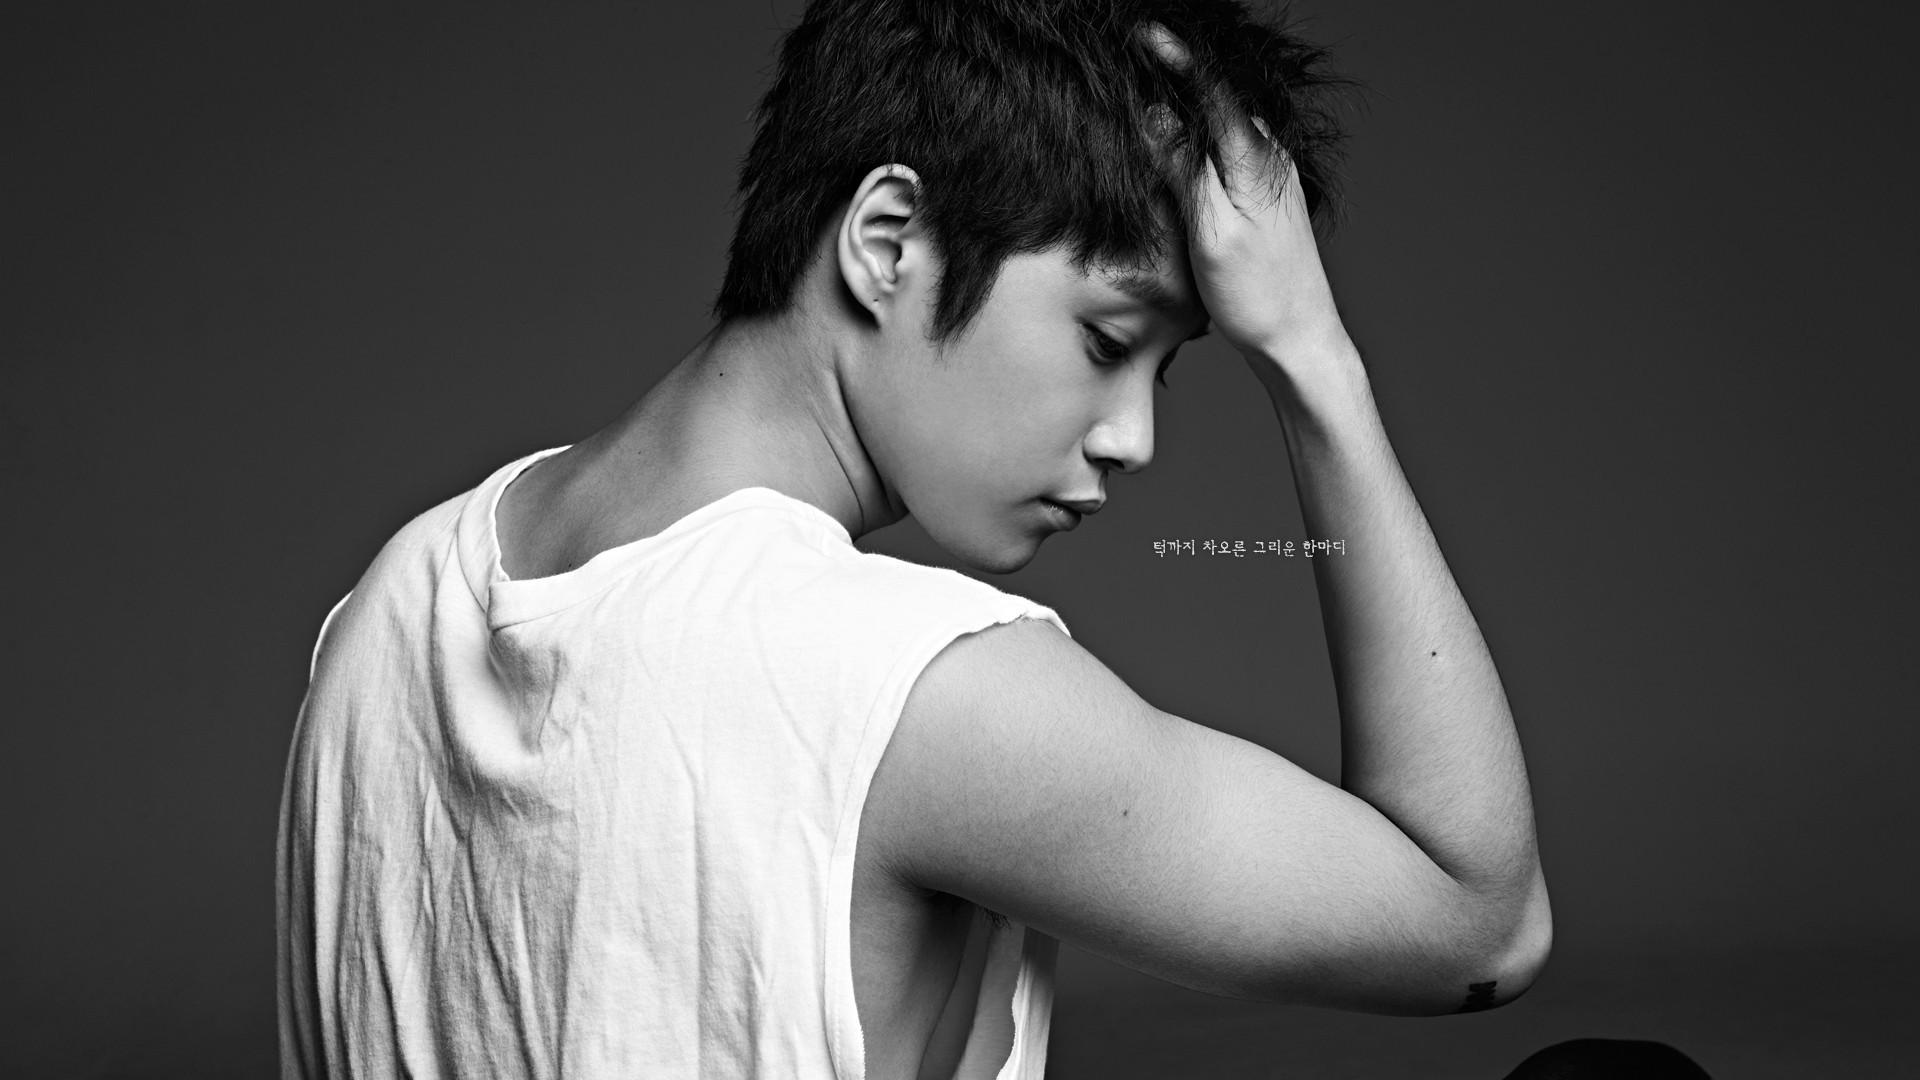 101113 - jaejin photo teaser @ the mood